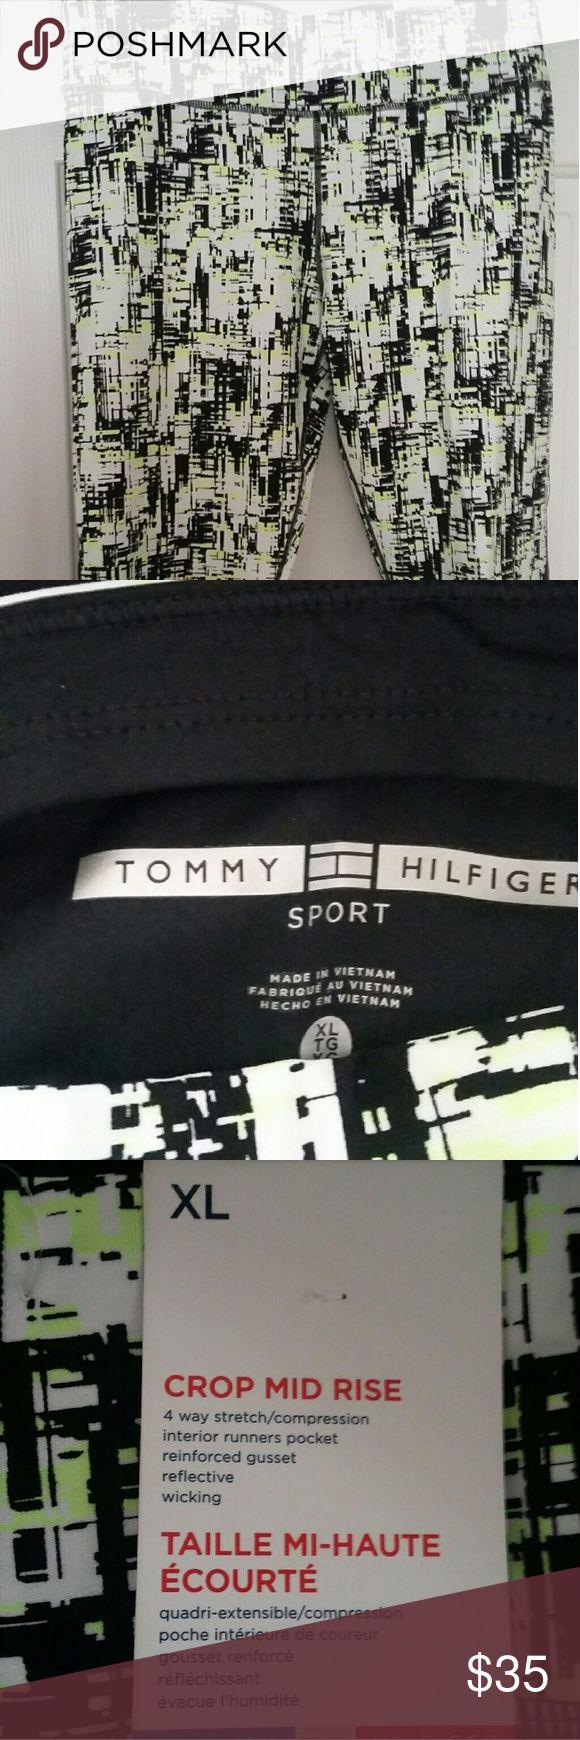 Tommy Hilfiger crop mid rise pants sport Nwt XL crop mid rise pants print Tommy Hilfiger Pants Leggings